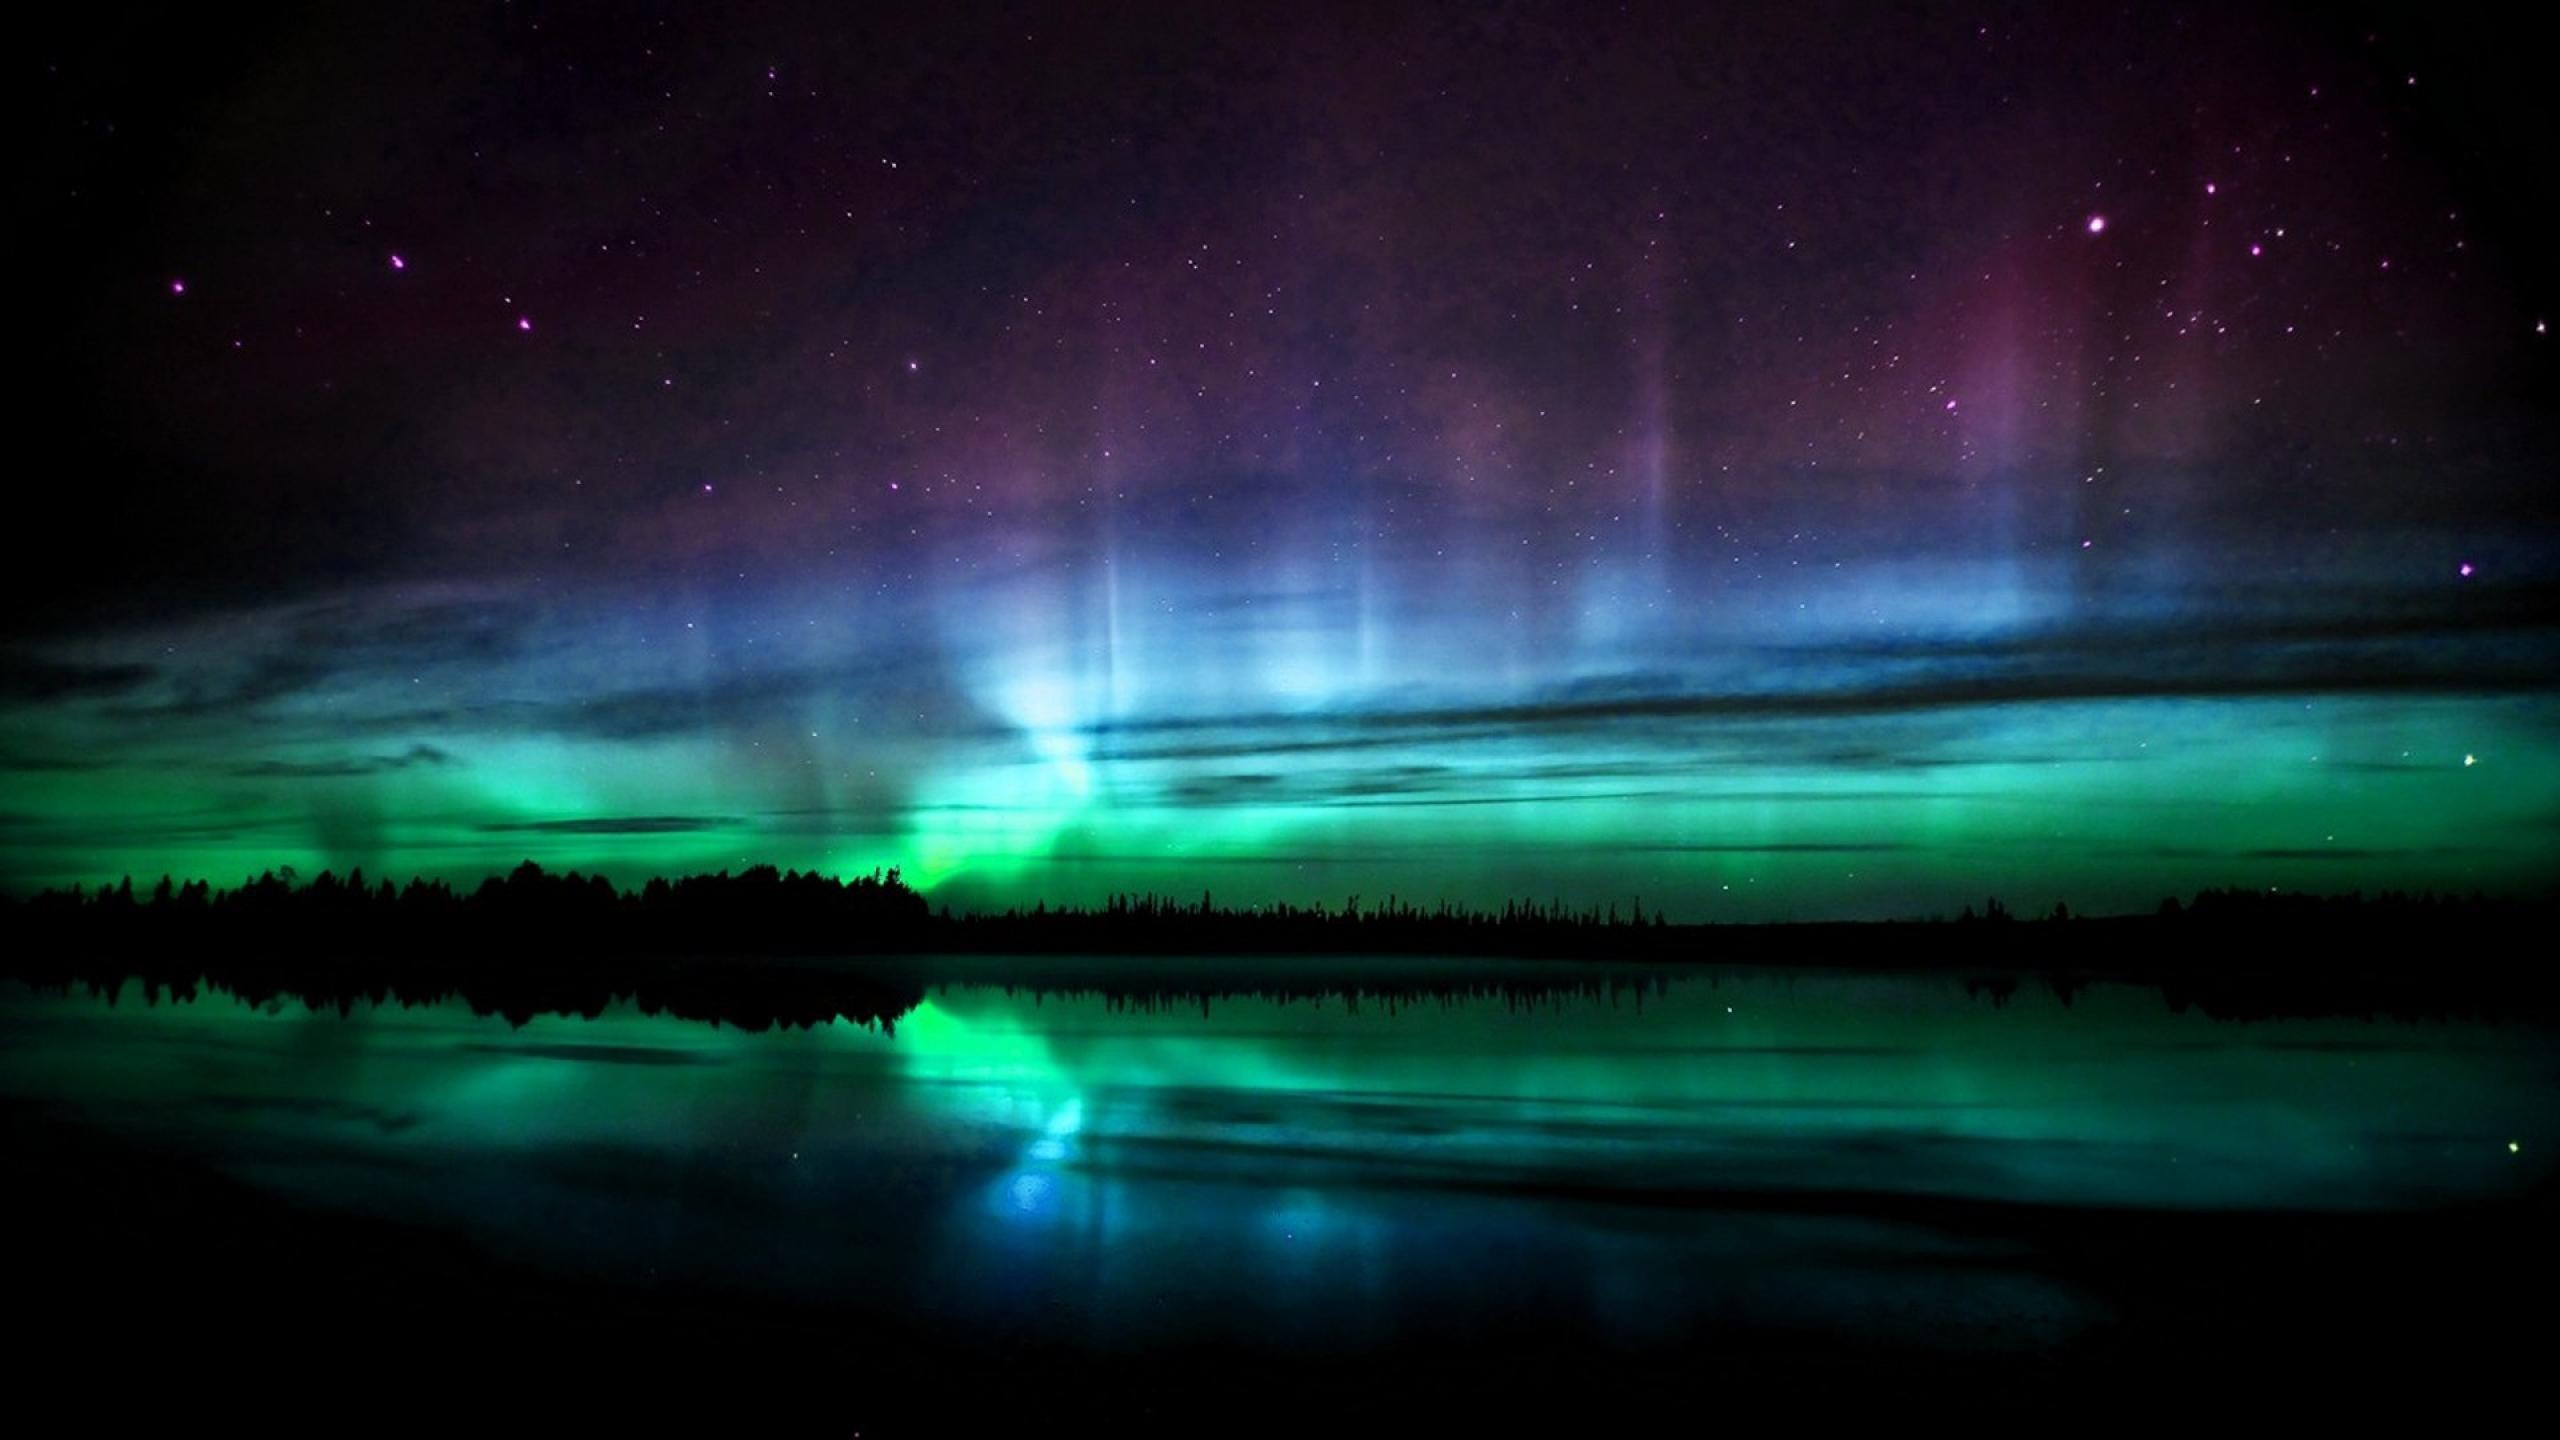 aurora borealis 1920x1080 wallpaper Wallpaper Wallpapers 2560x1440